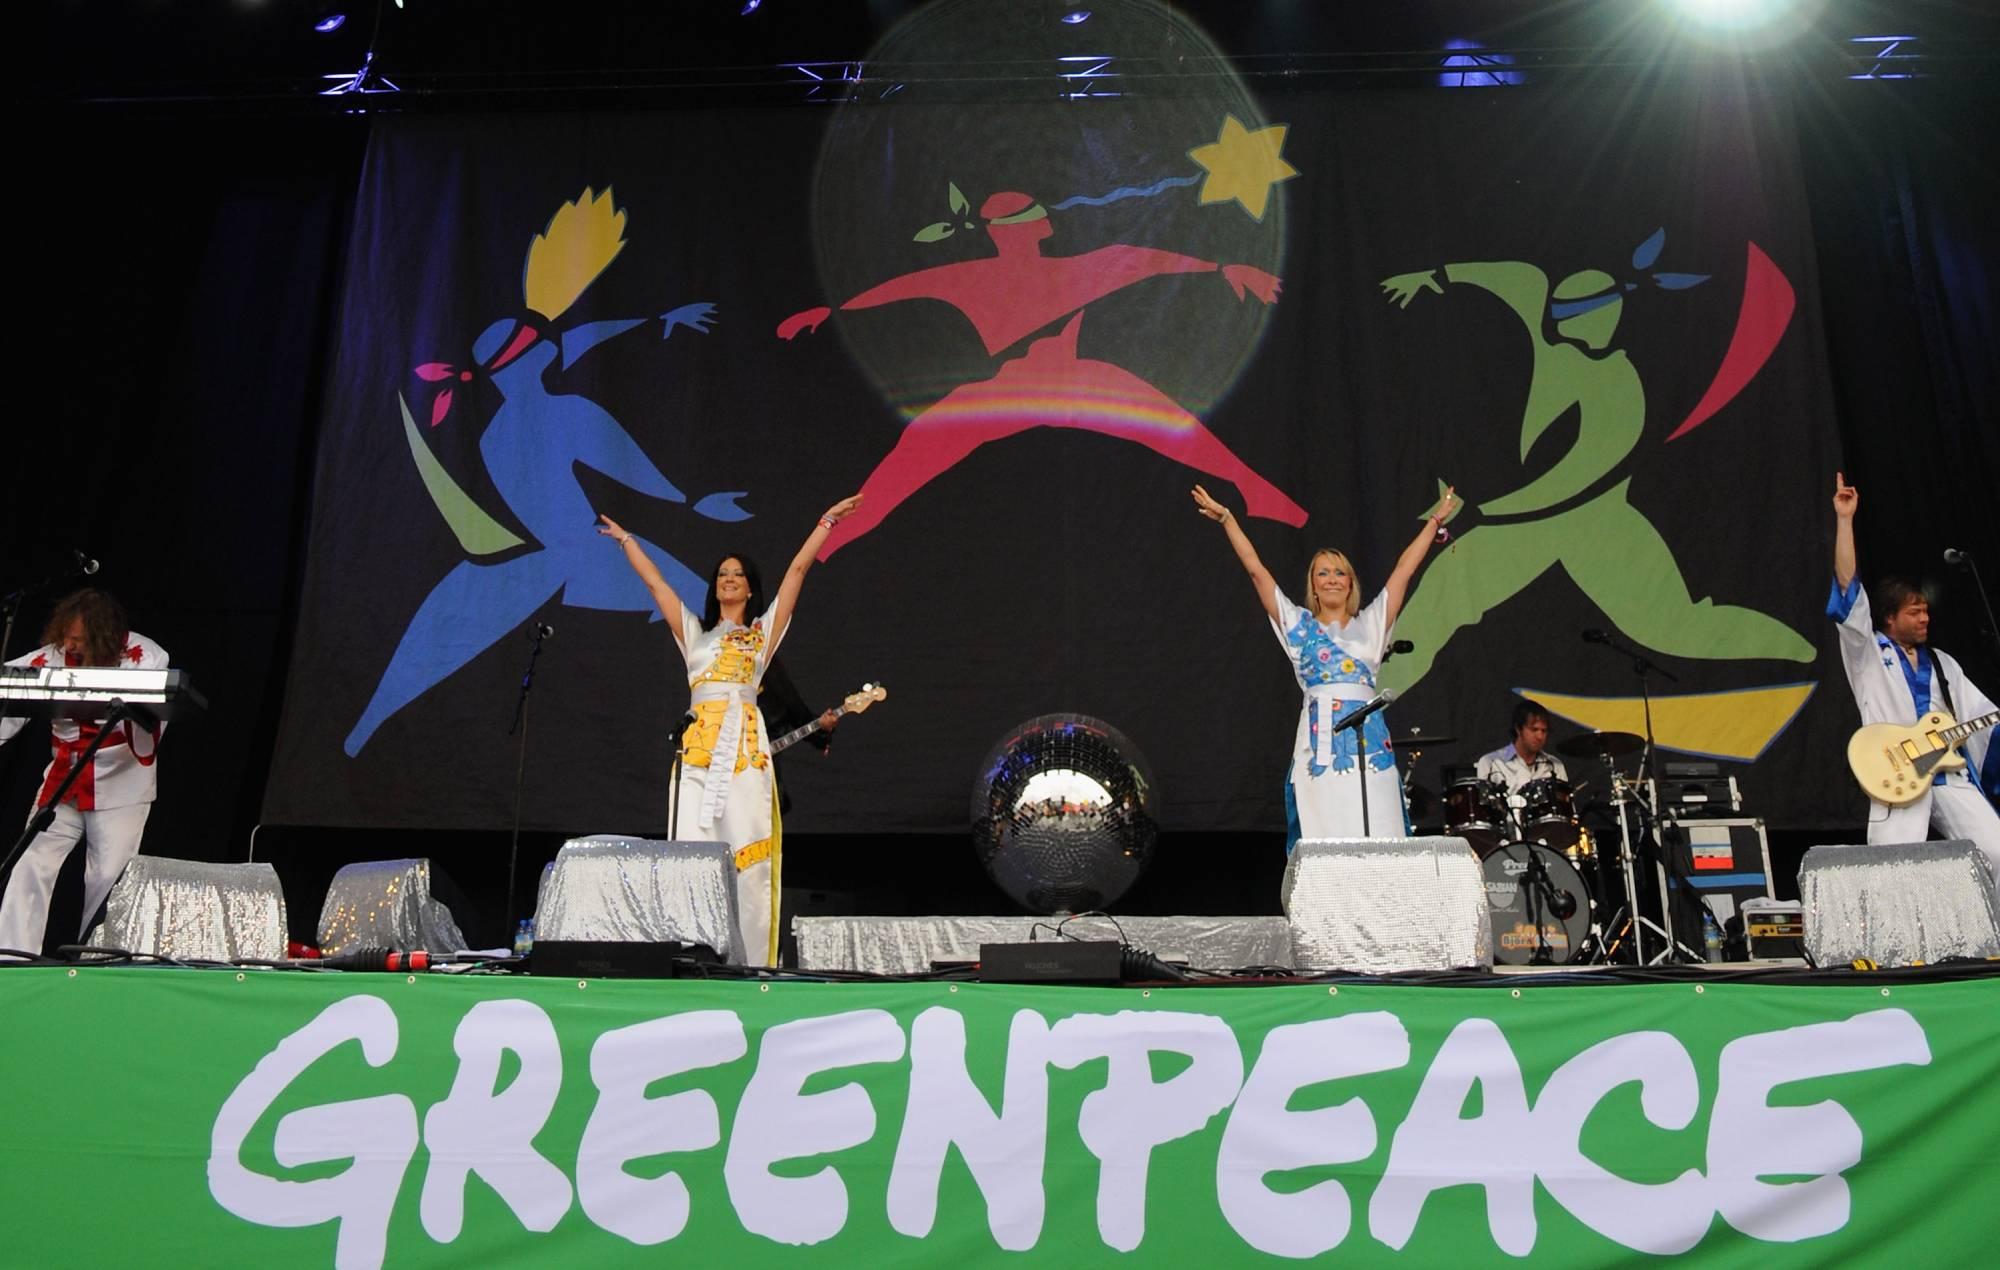 glastonbury greenpeace